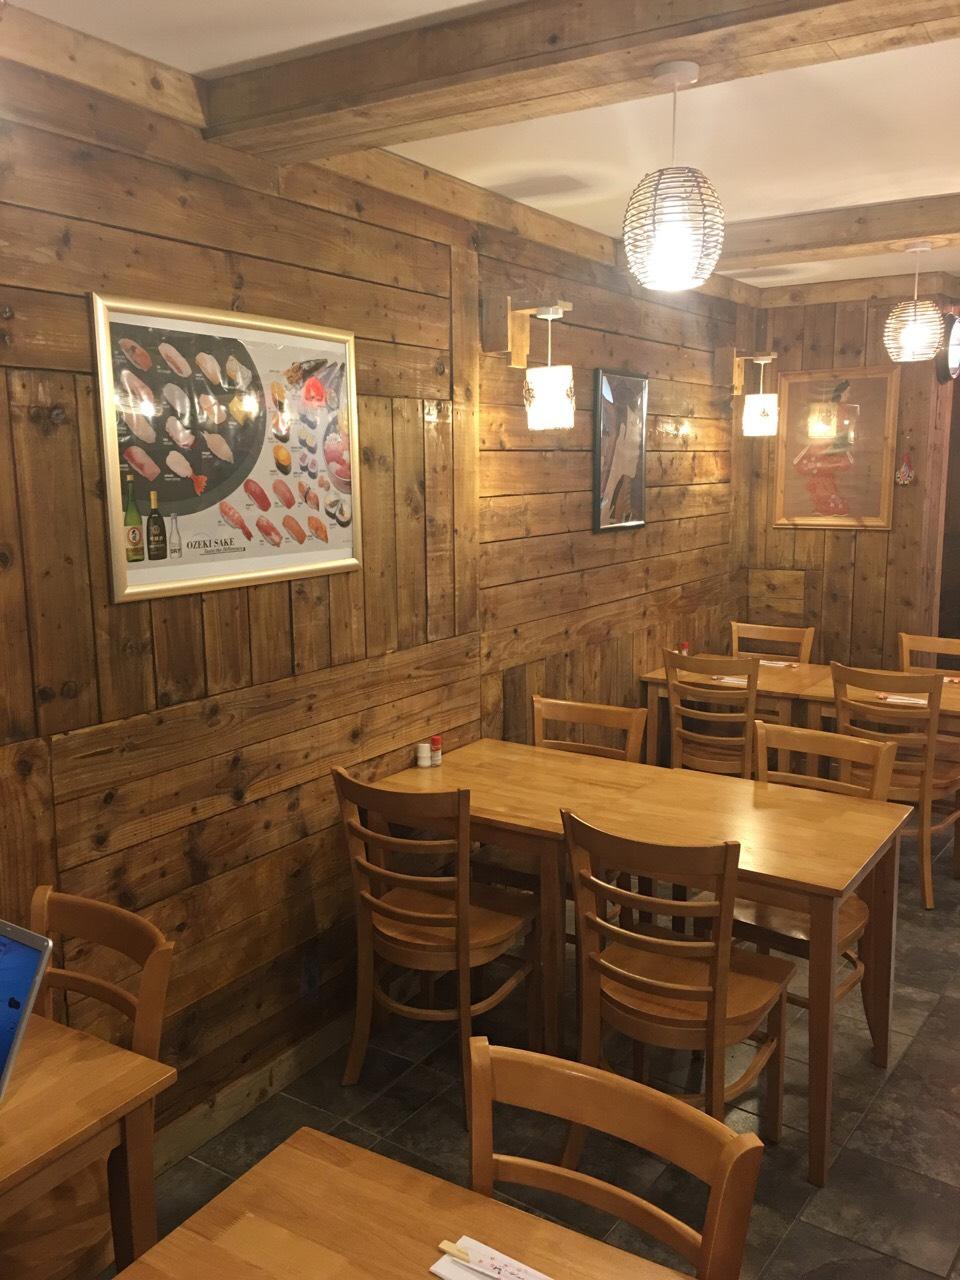 Aburi Japanese restaurant in Colchester, Essex where to eat in essex